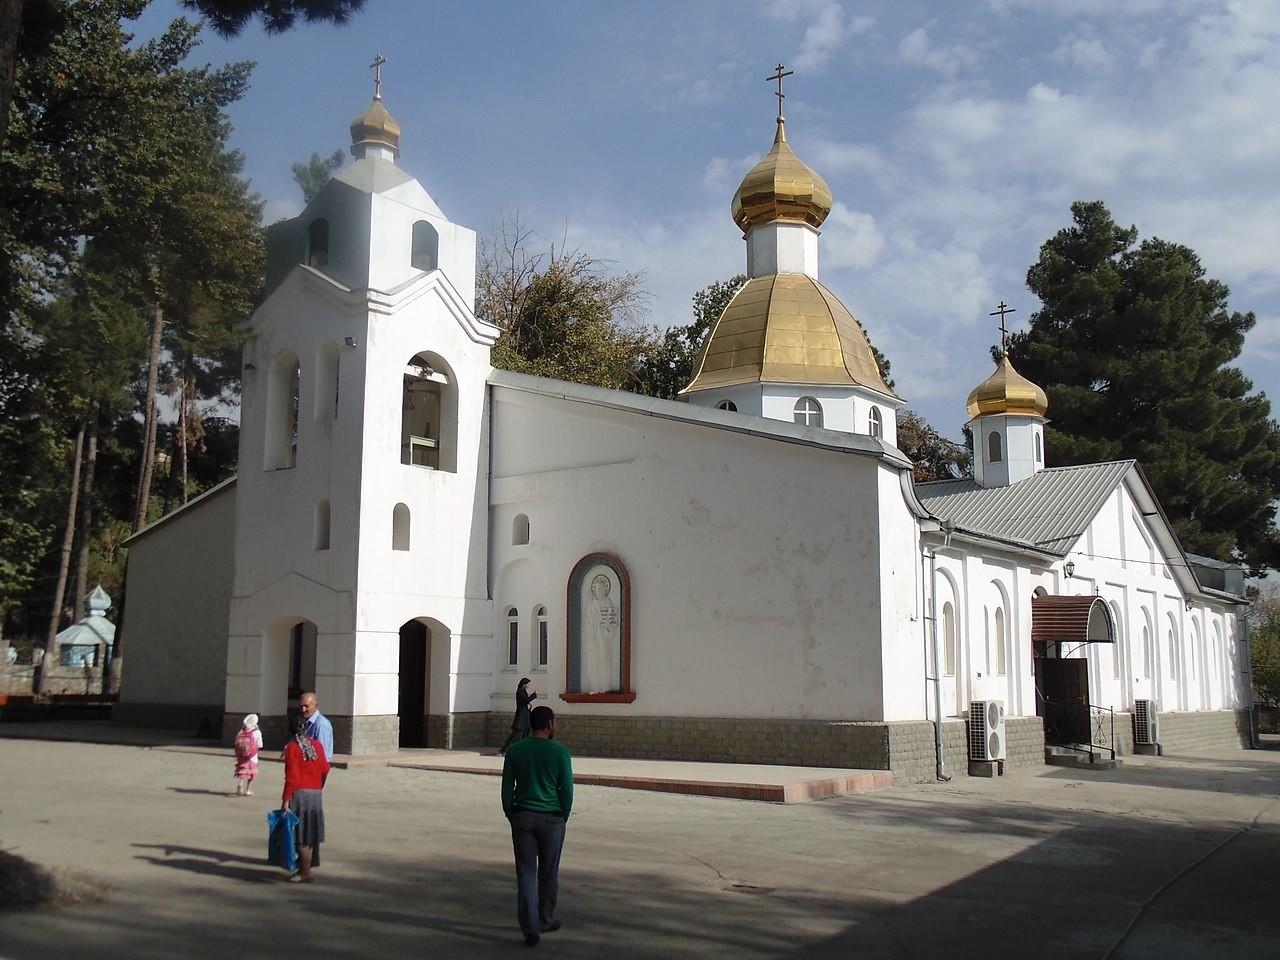 Kathedrale St. Nikolaus in Duschanbe, heute Tadschikistan, erbaut 1943